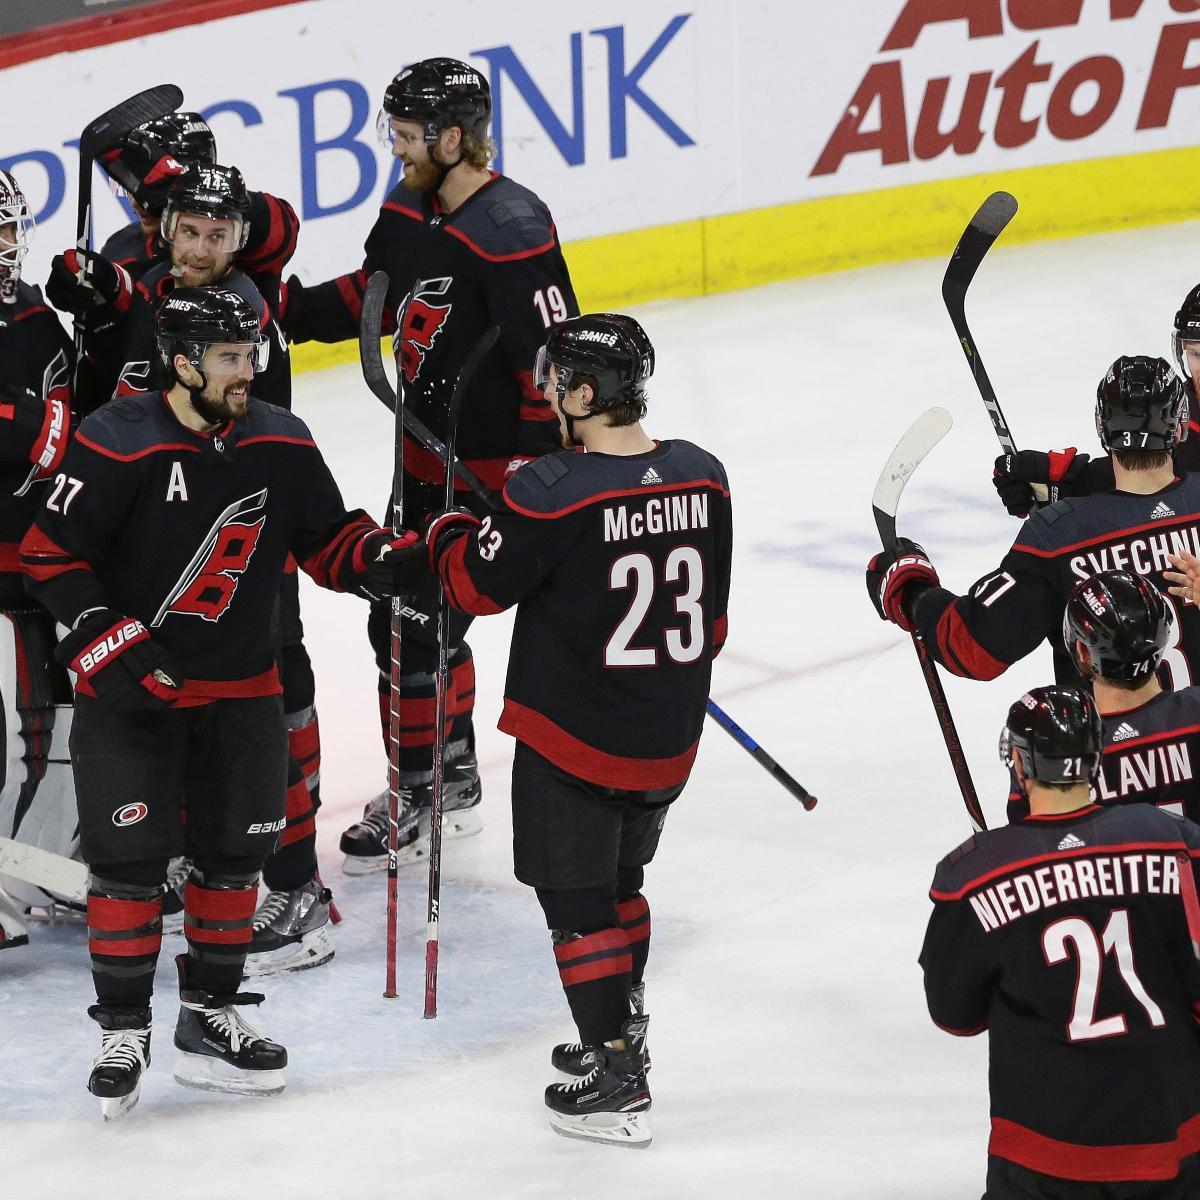 NHL Playoffs 2019: Latest Stanley Cup TV Schedule, Game